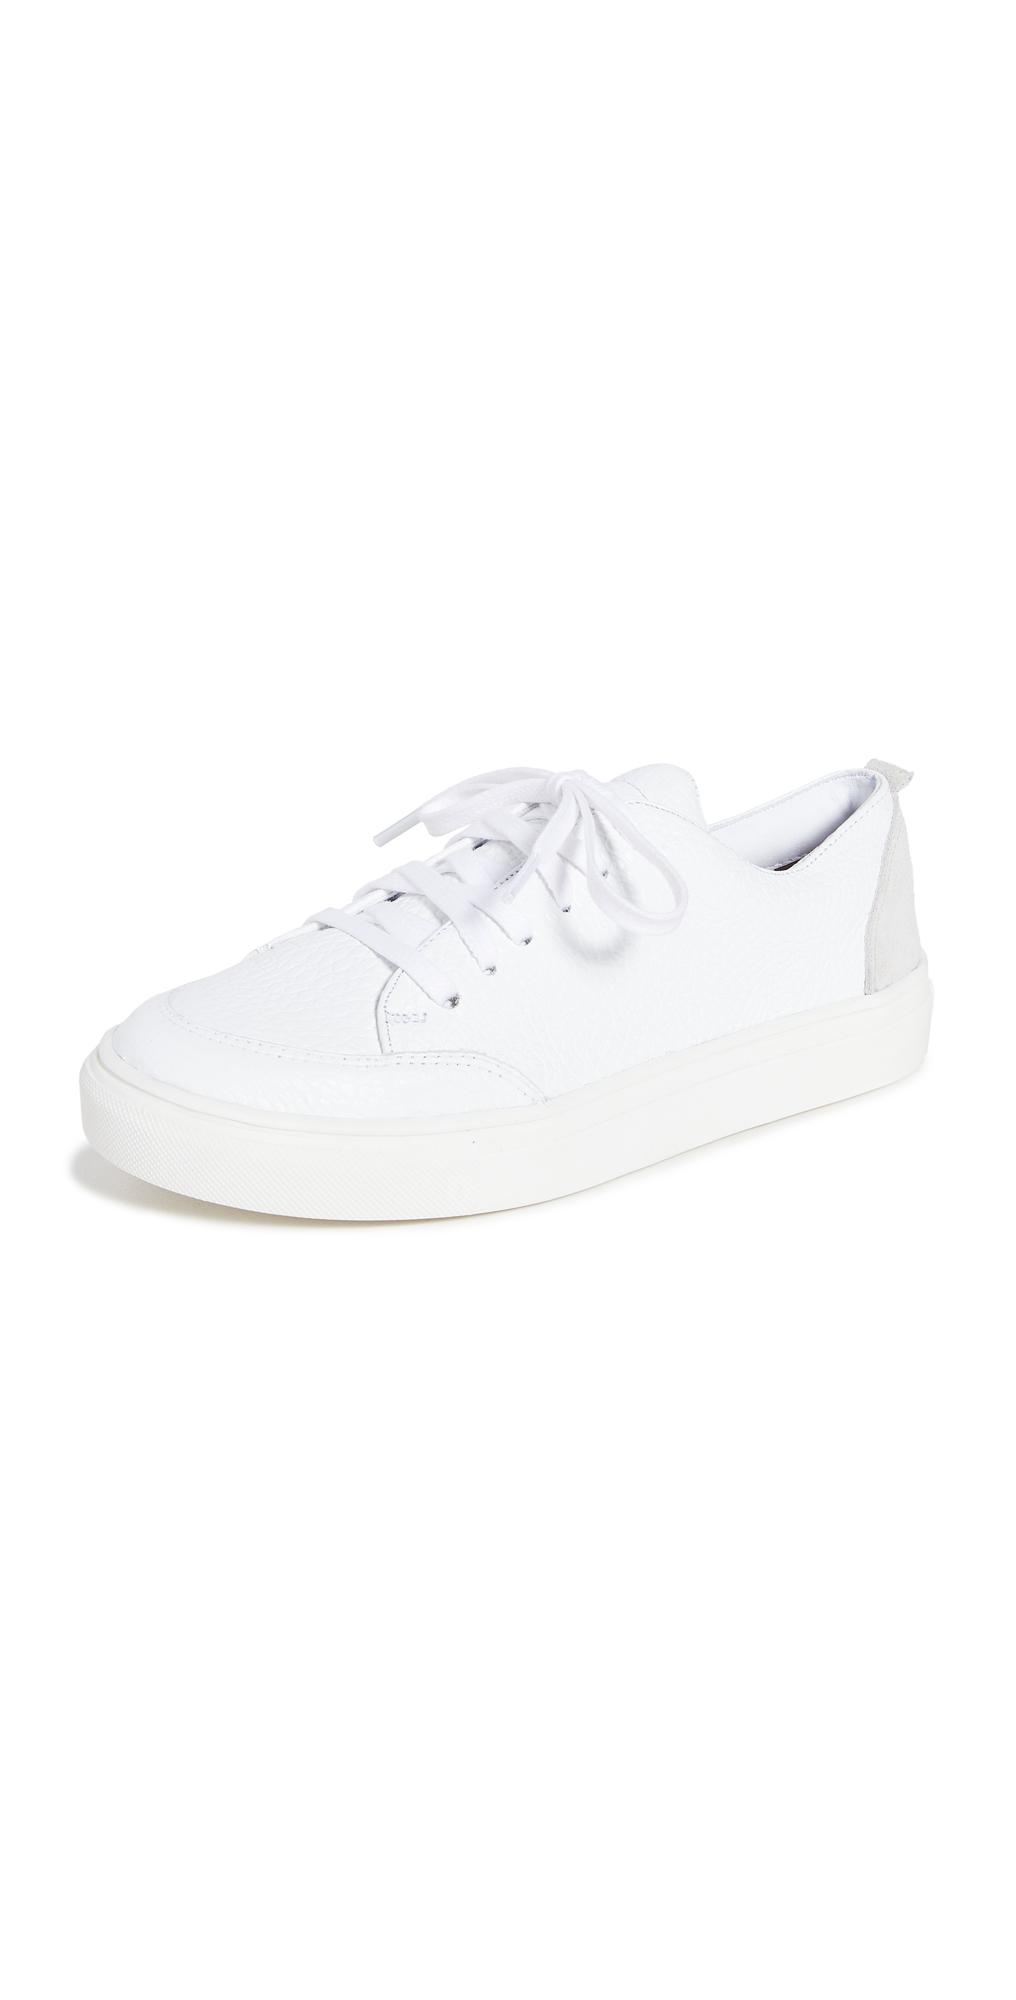 KAANAS Paris Lace Up Sneakers